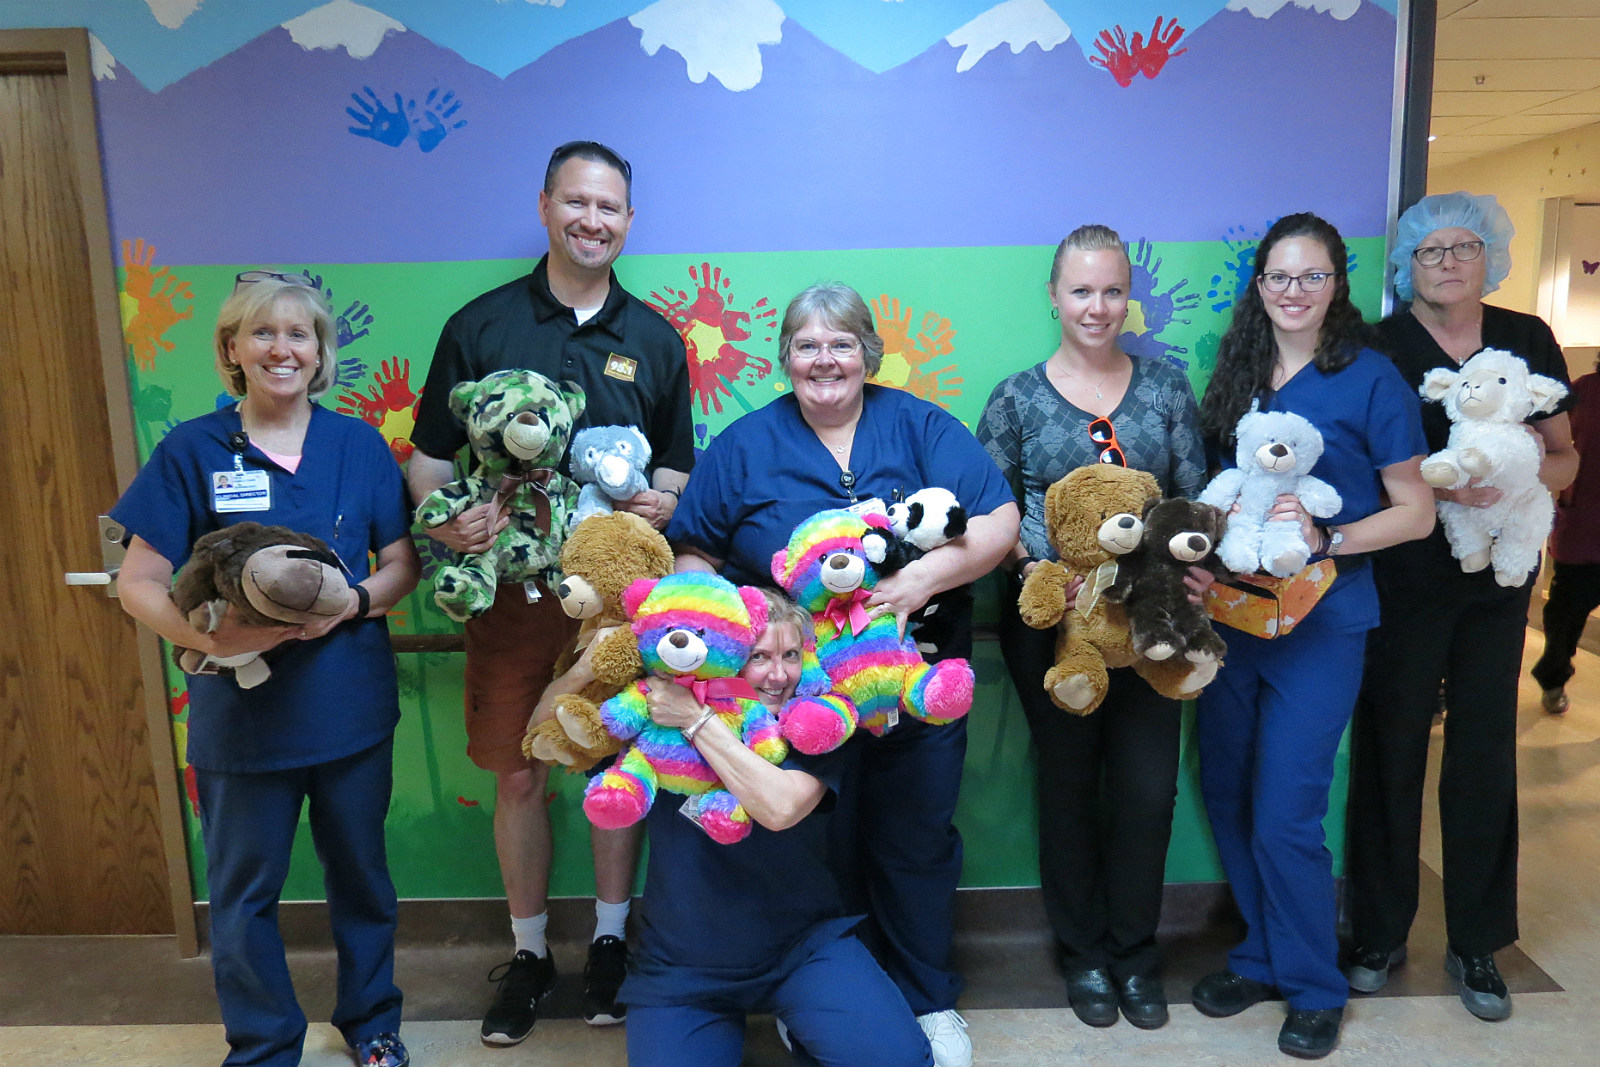 Teddy Bears, Stuffed Animals, IMH, Laramie, Donation